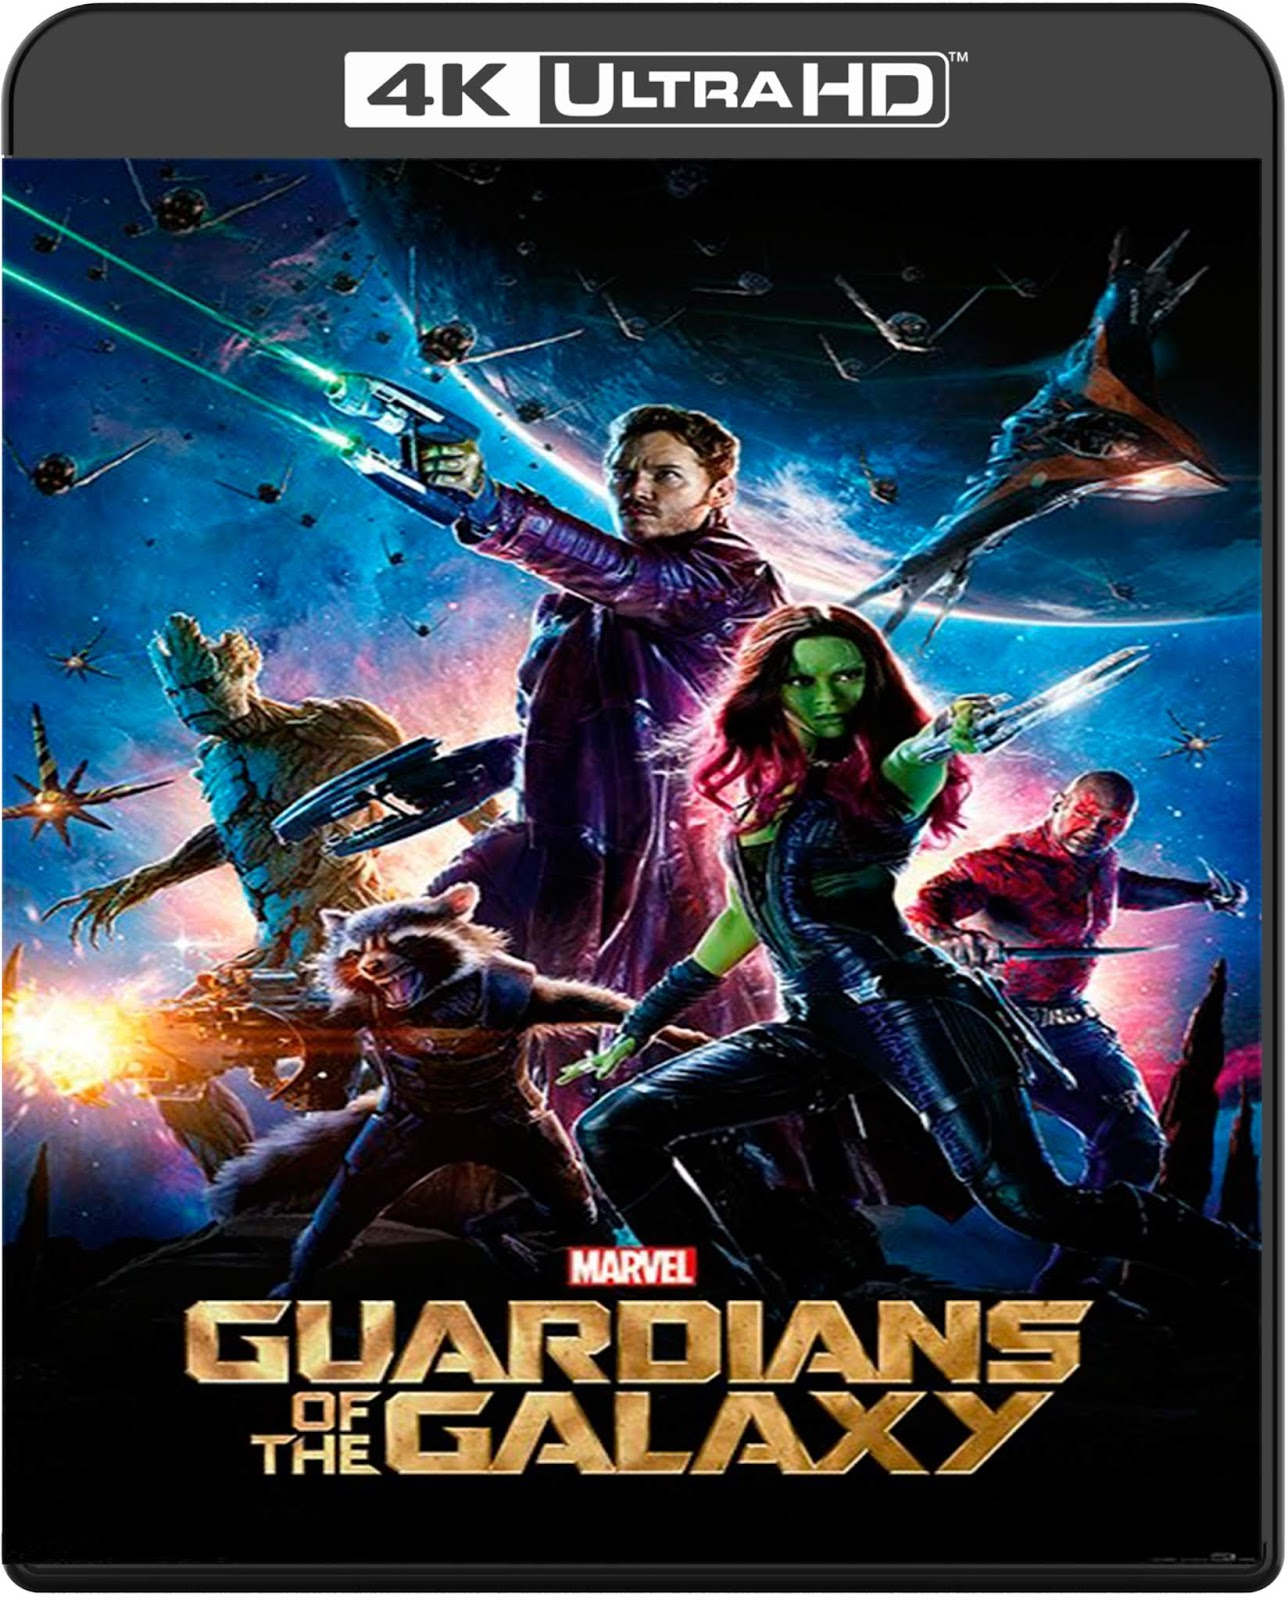 Guardians of the Galaxy [2014] [UHD] [2160p] [Latino]